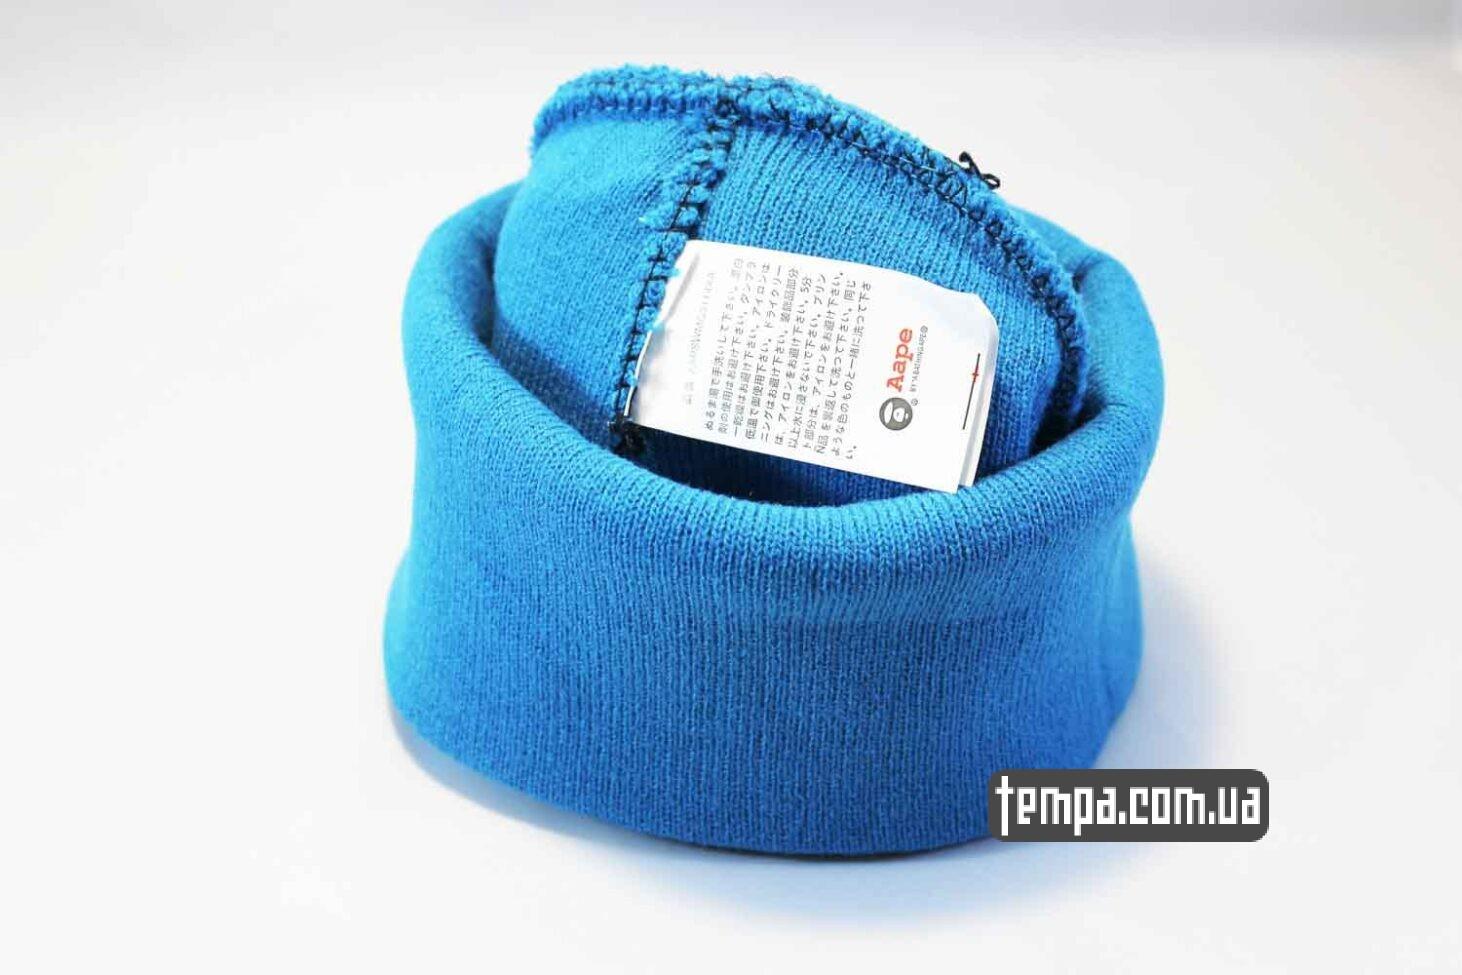 aape украина магазин шапка beanie Aape ярко голубая купить Украина